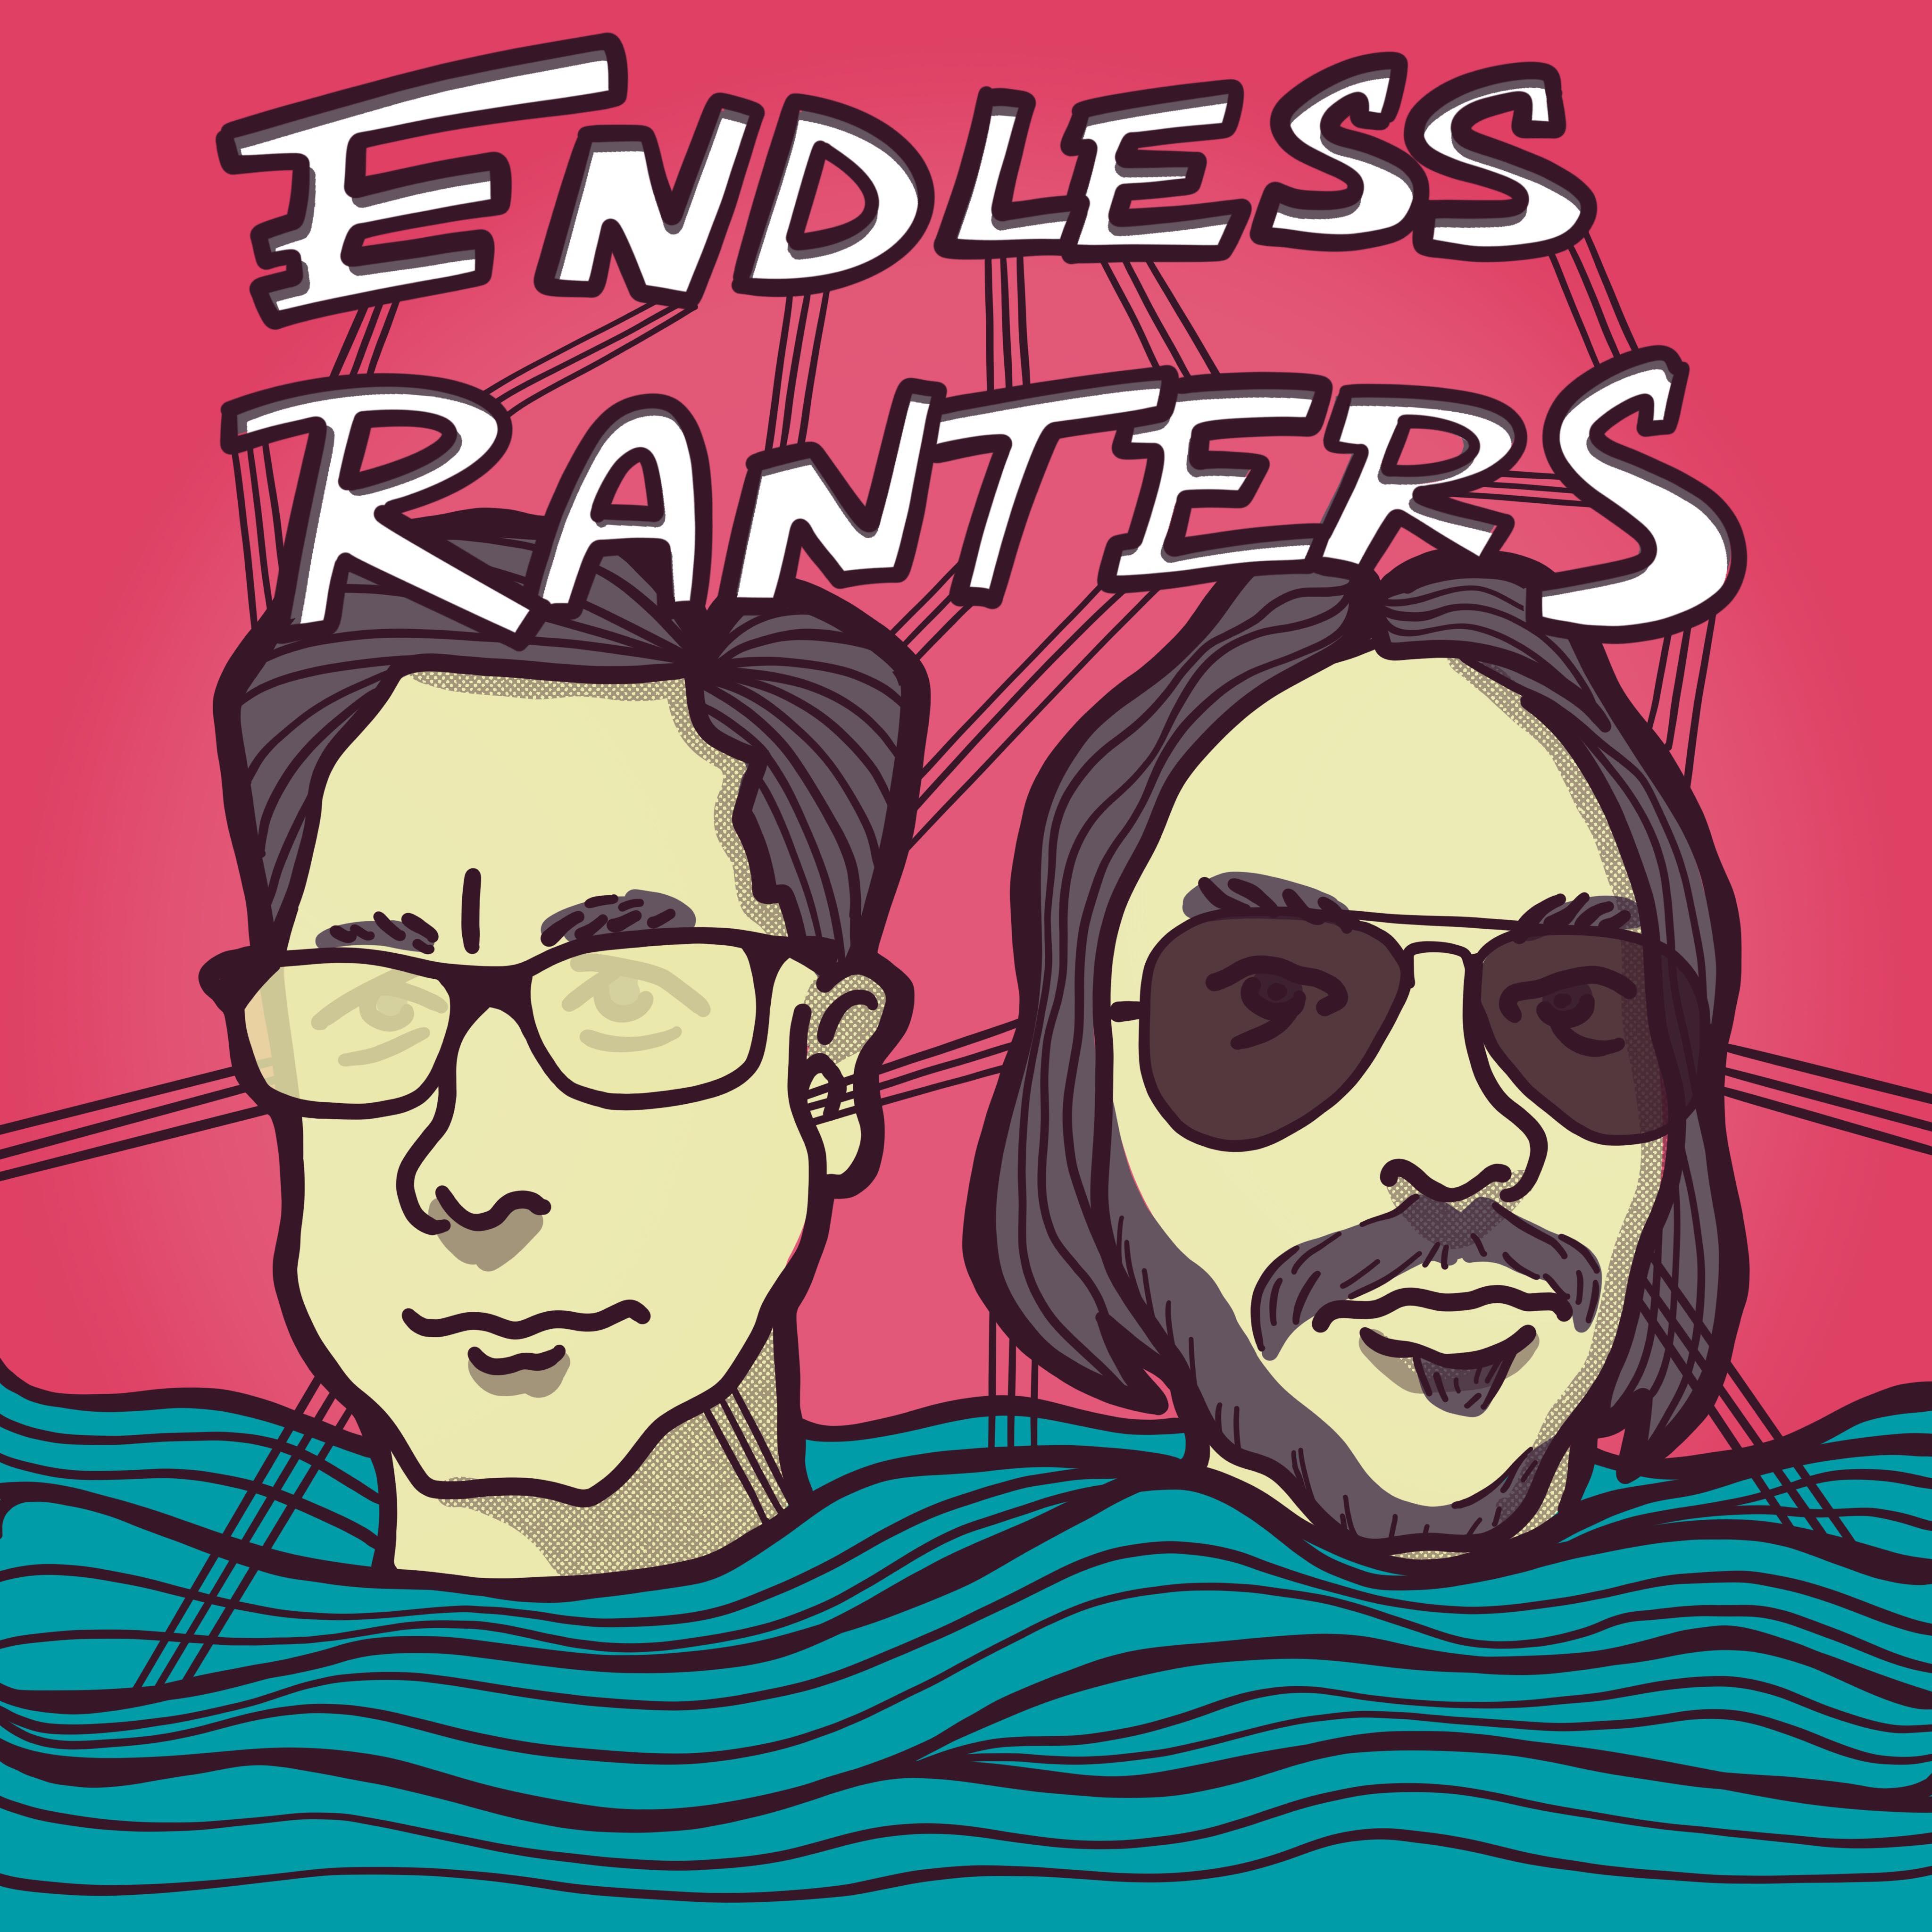 Endless Ranters